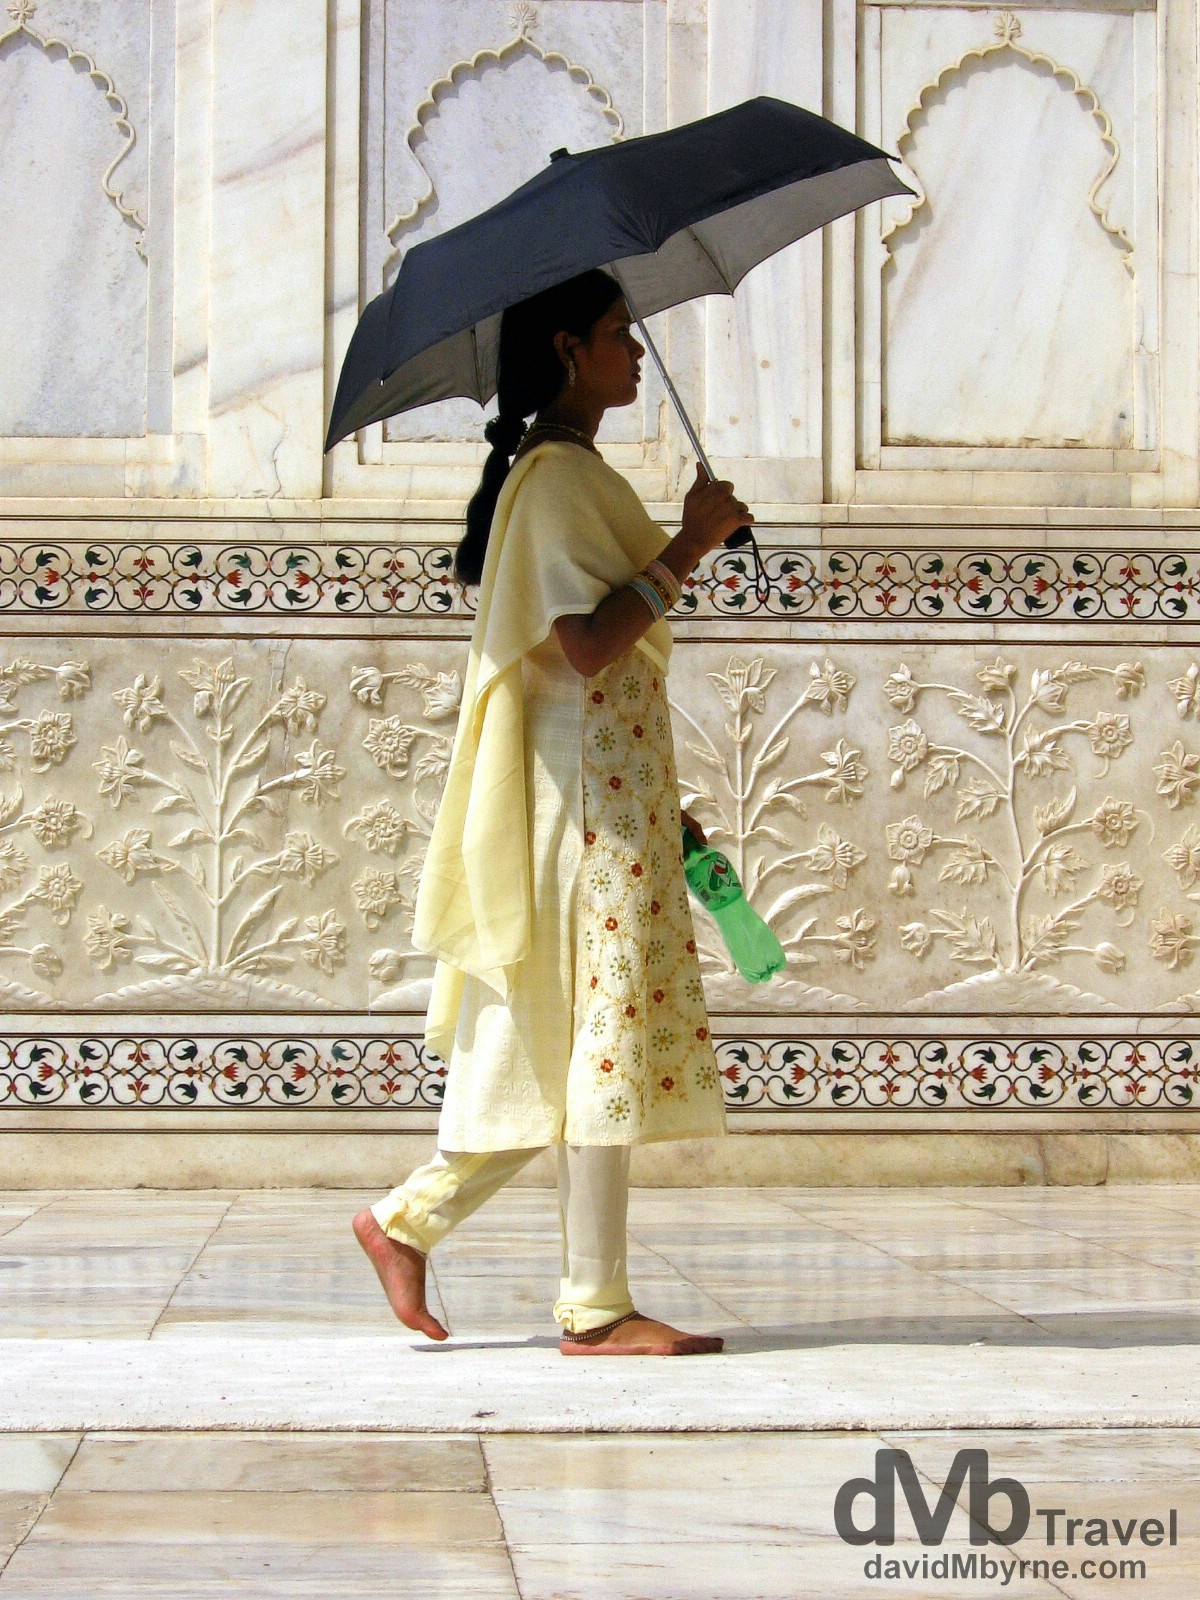 Entering the central chamber of the Taj Mahal, Agra, Uttar Pradesh, India. March 25, 2008.